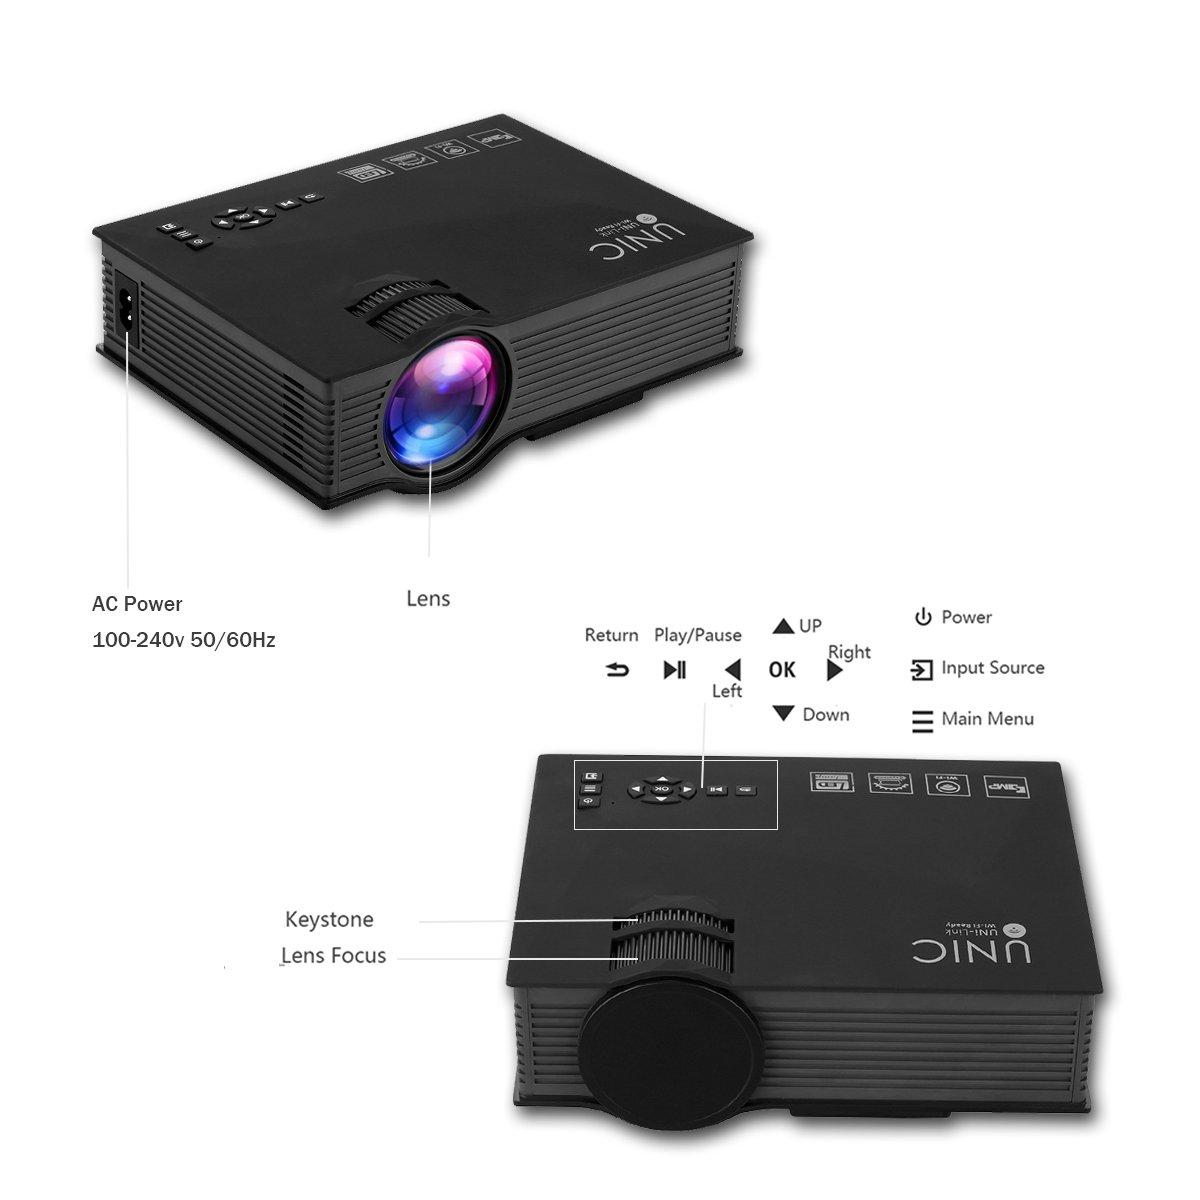 UNIC uc46 + - Proyector HD 1080P duplicacion funda PC WIFI Cable ...